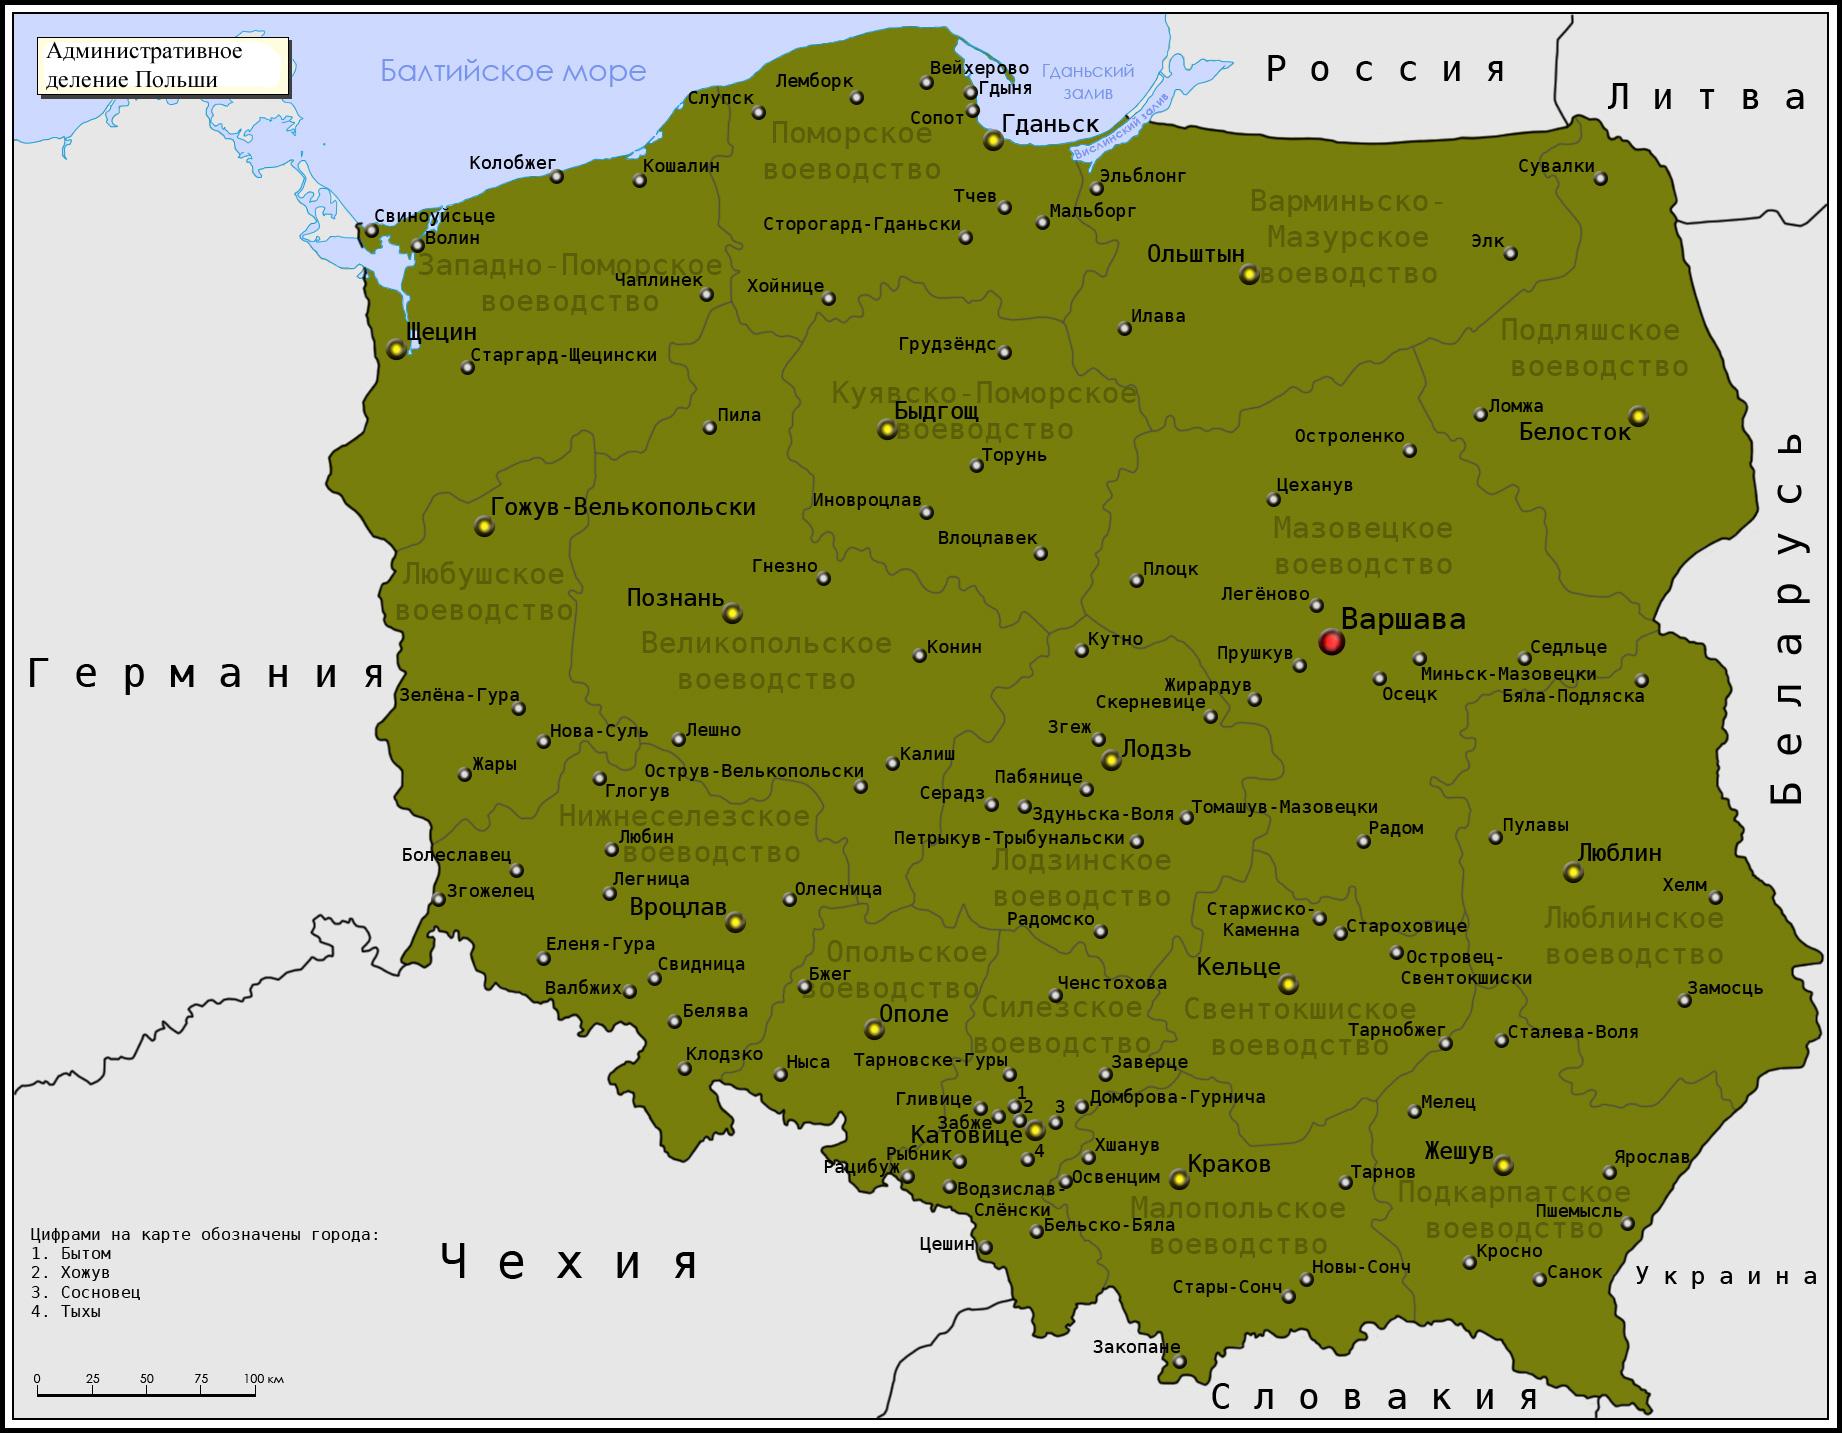 http://www.gect.ru/country/europe/poland/maps/political_maps_of_poland1.jpg